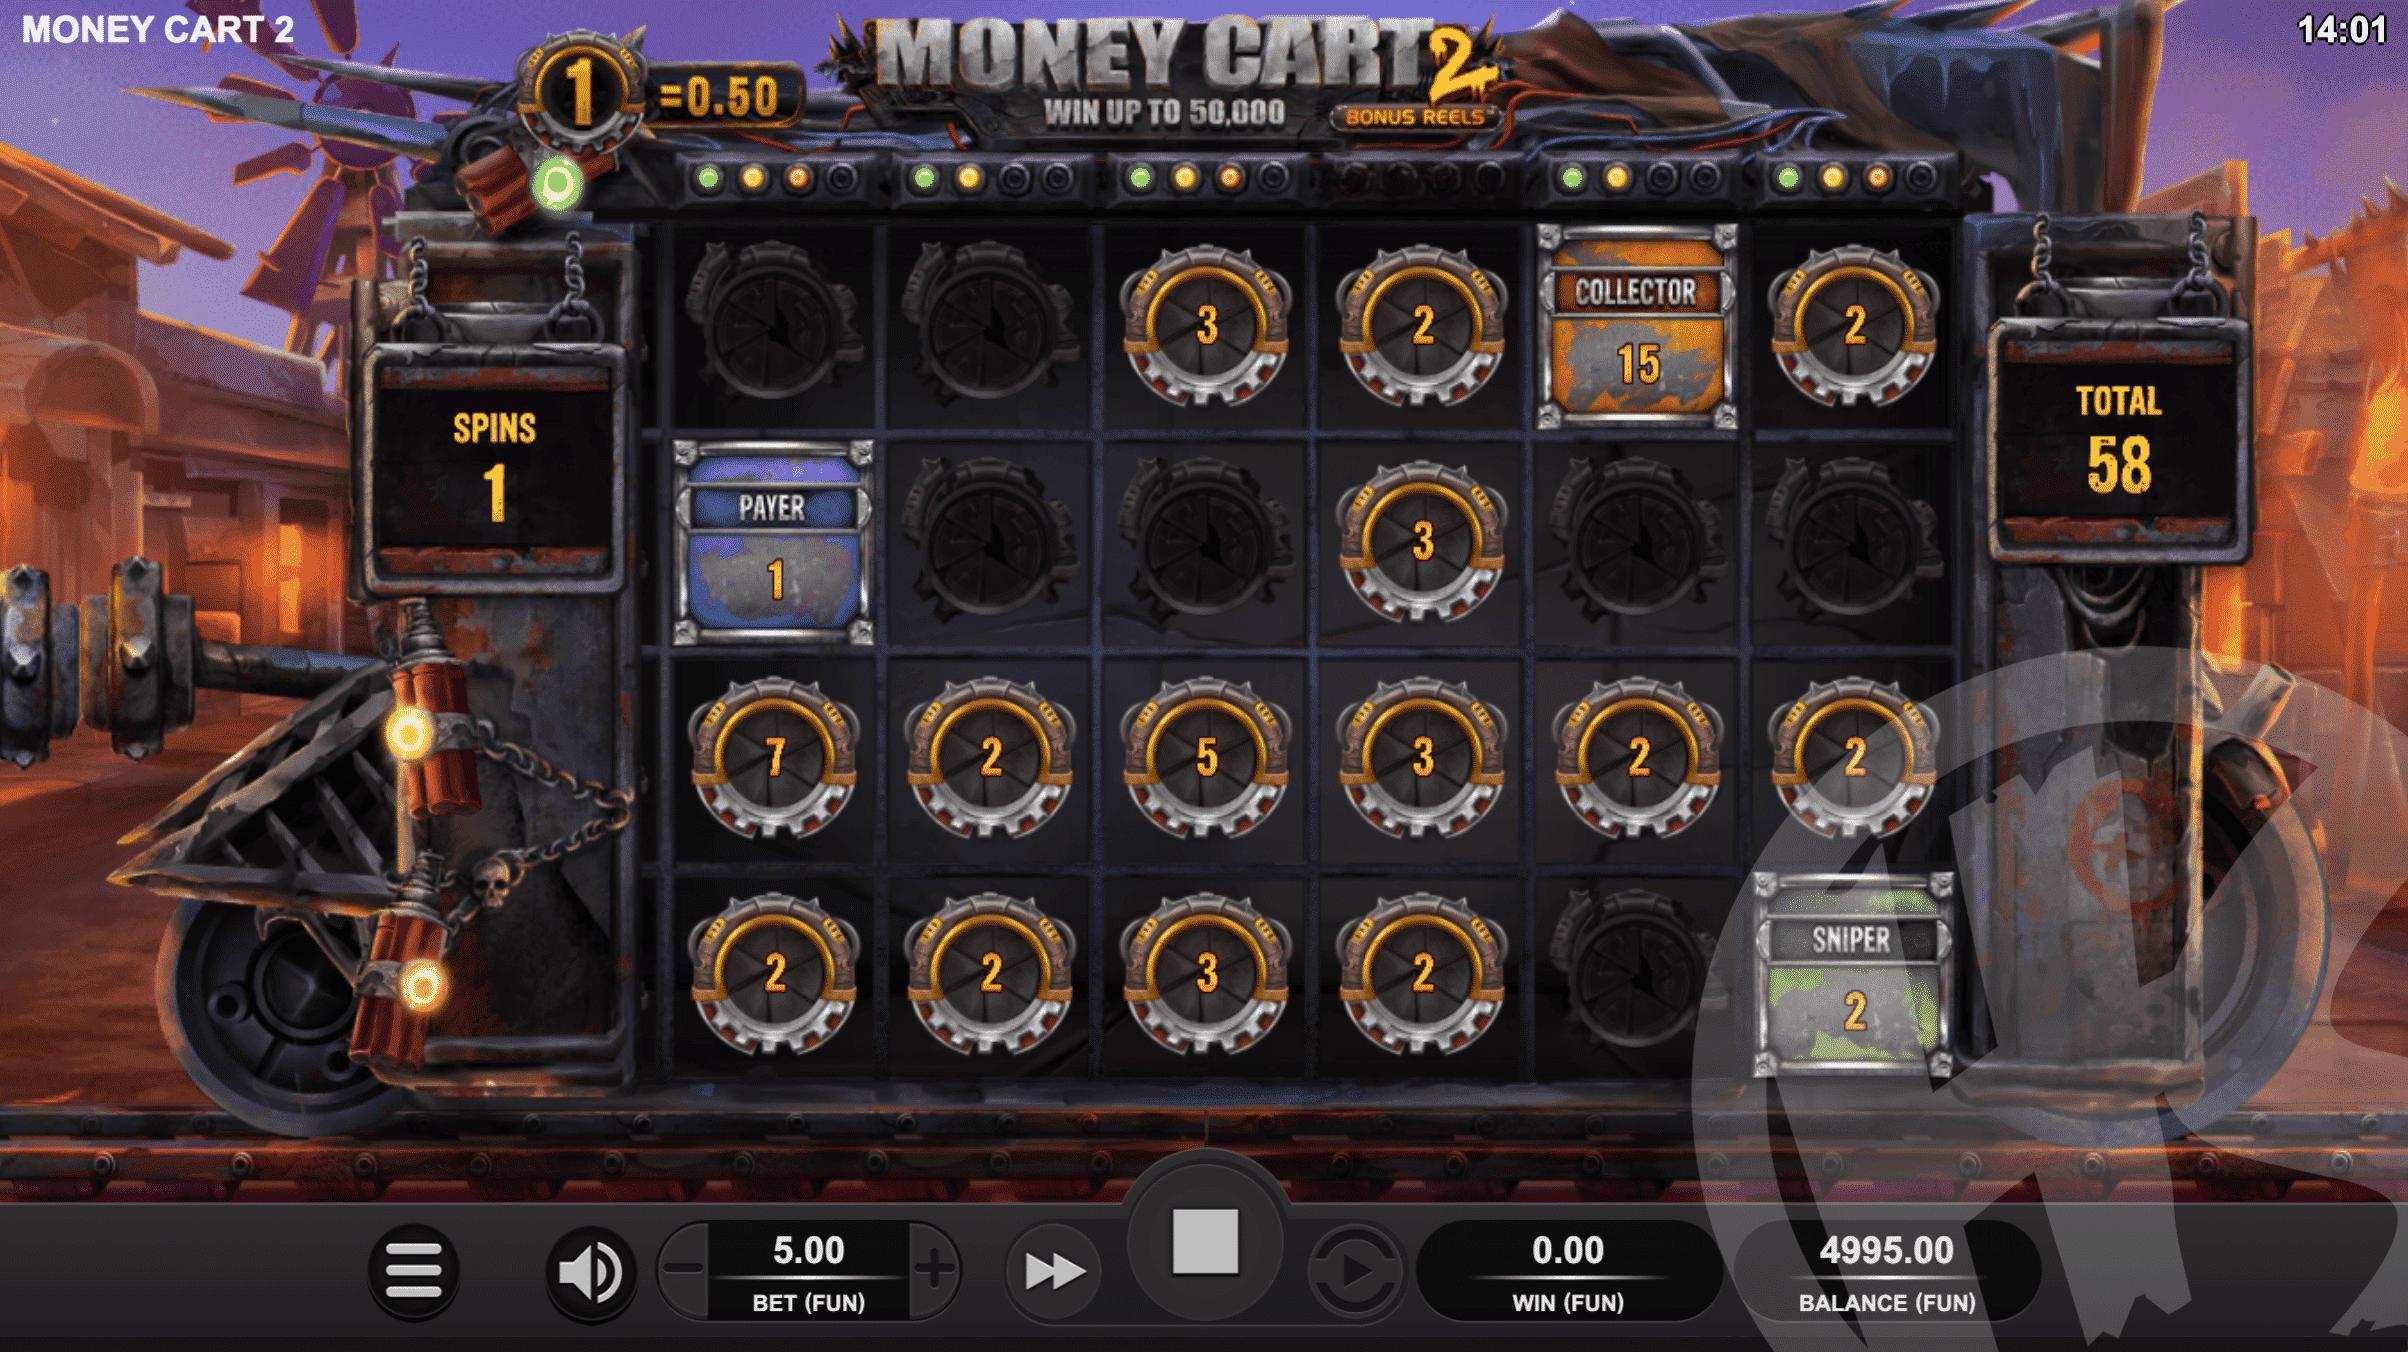 Money Cart 2 Bonus